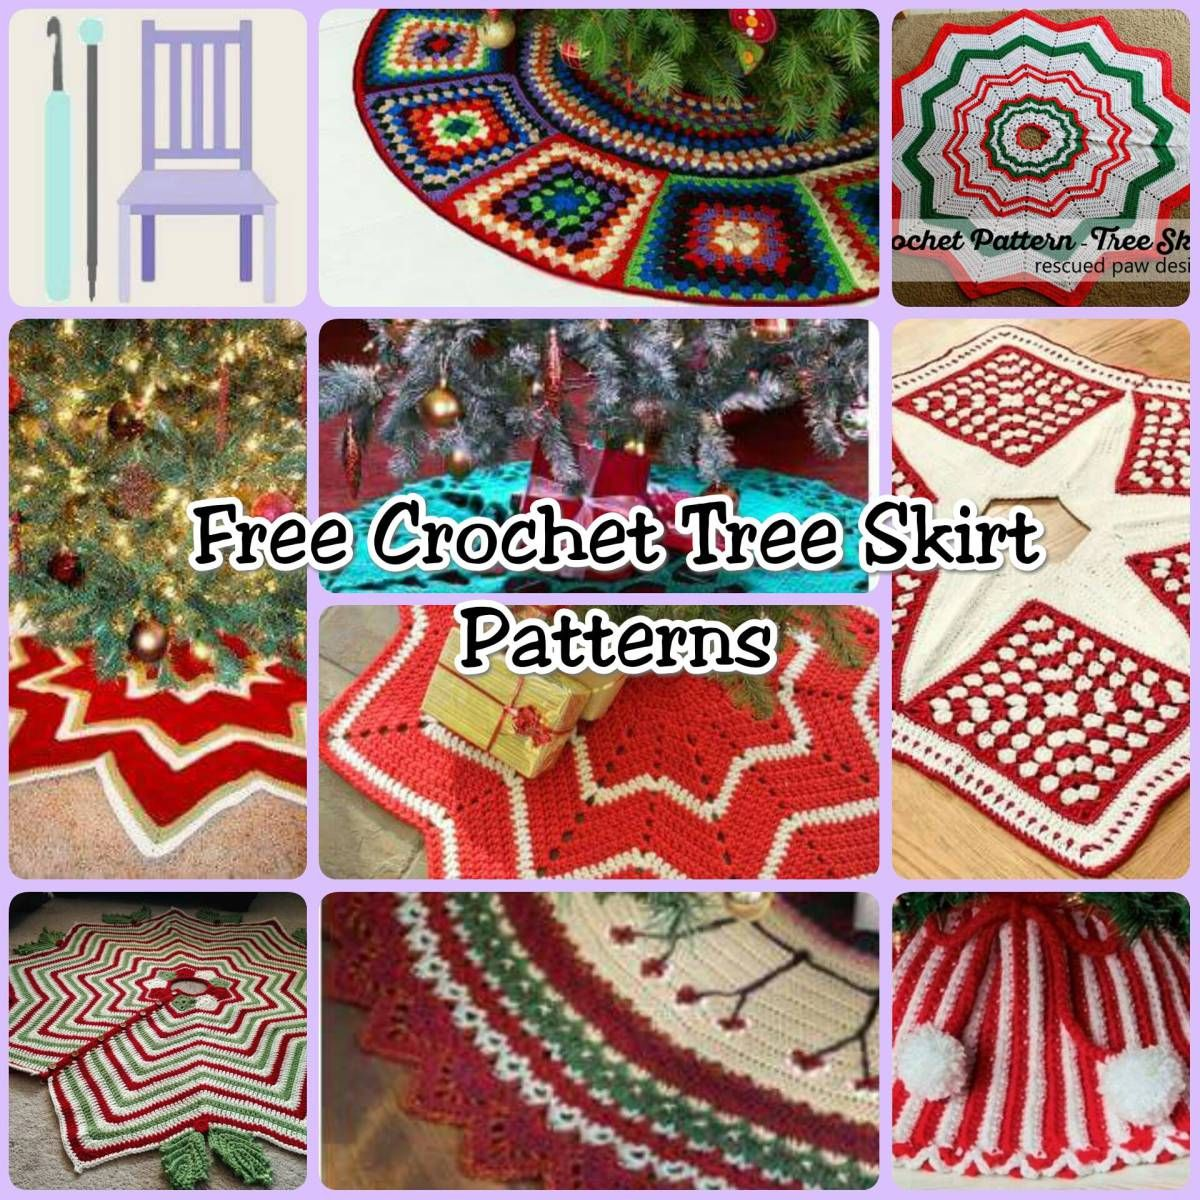 FREE Tree Skirt Crochet Patterns | Crochet tree skirt, Crochet tree ...